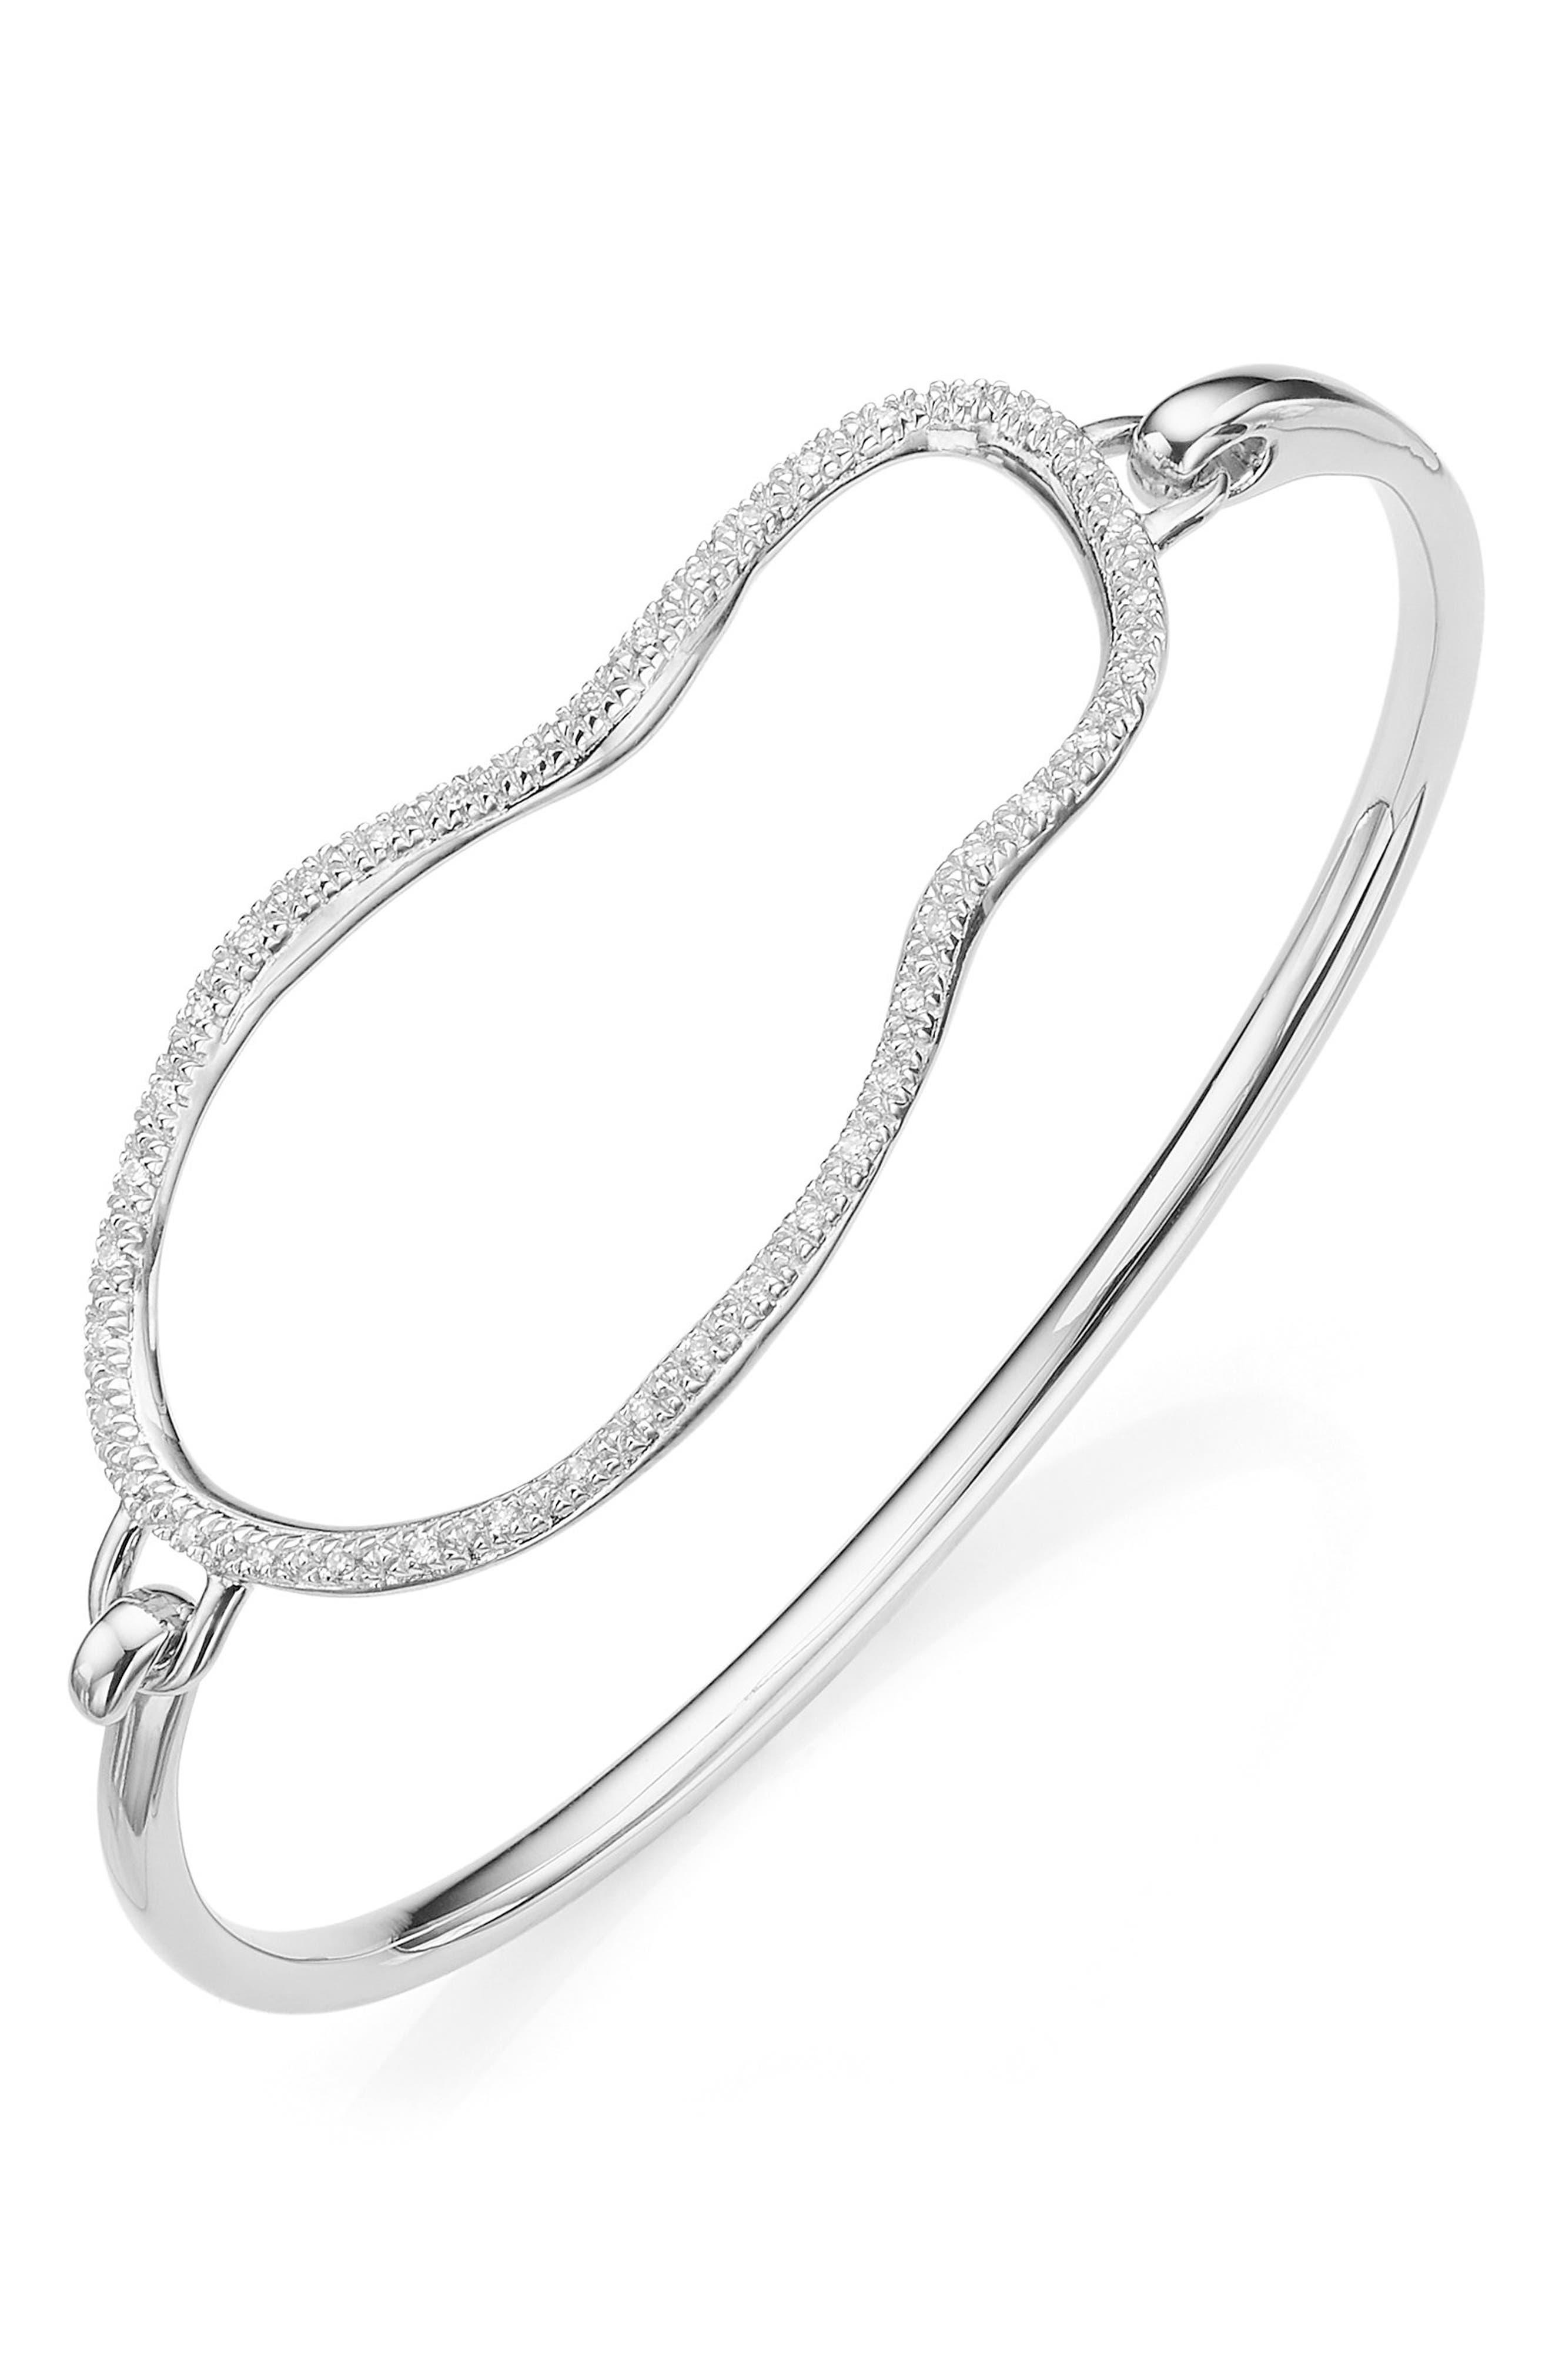 Riva Diamond Hook Bracelet,                             Alternate thumbnail 3, color,                             SILVER/ DIAMOND